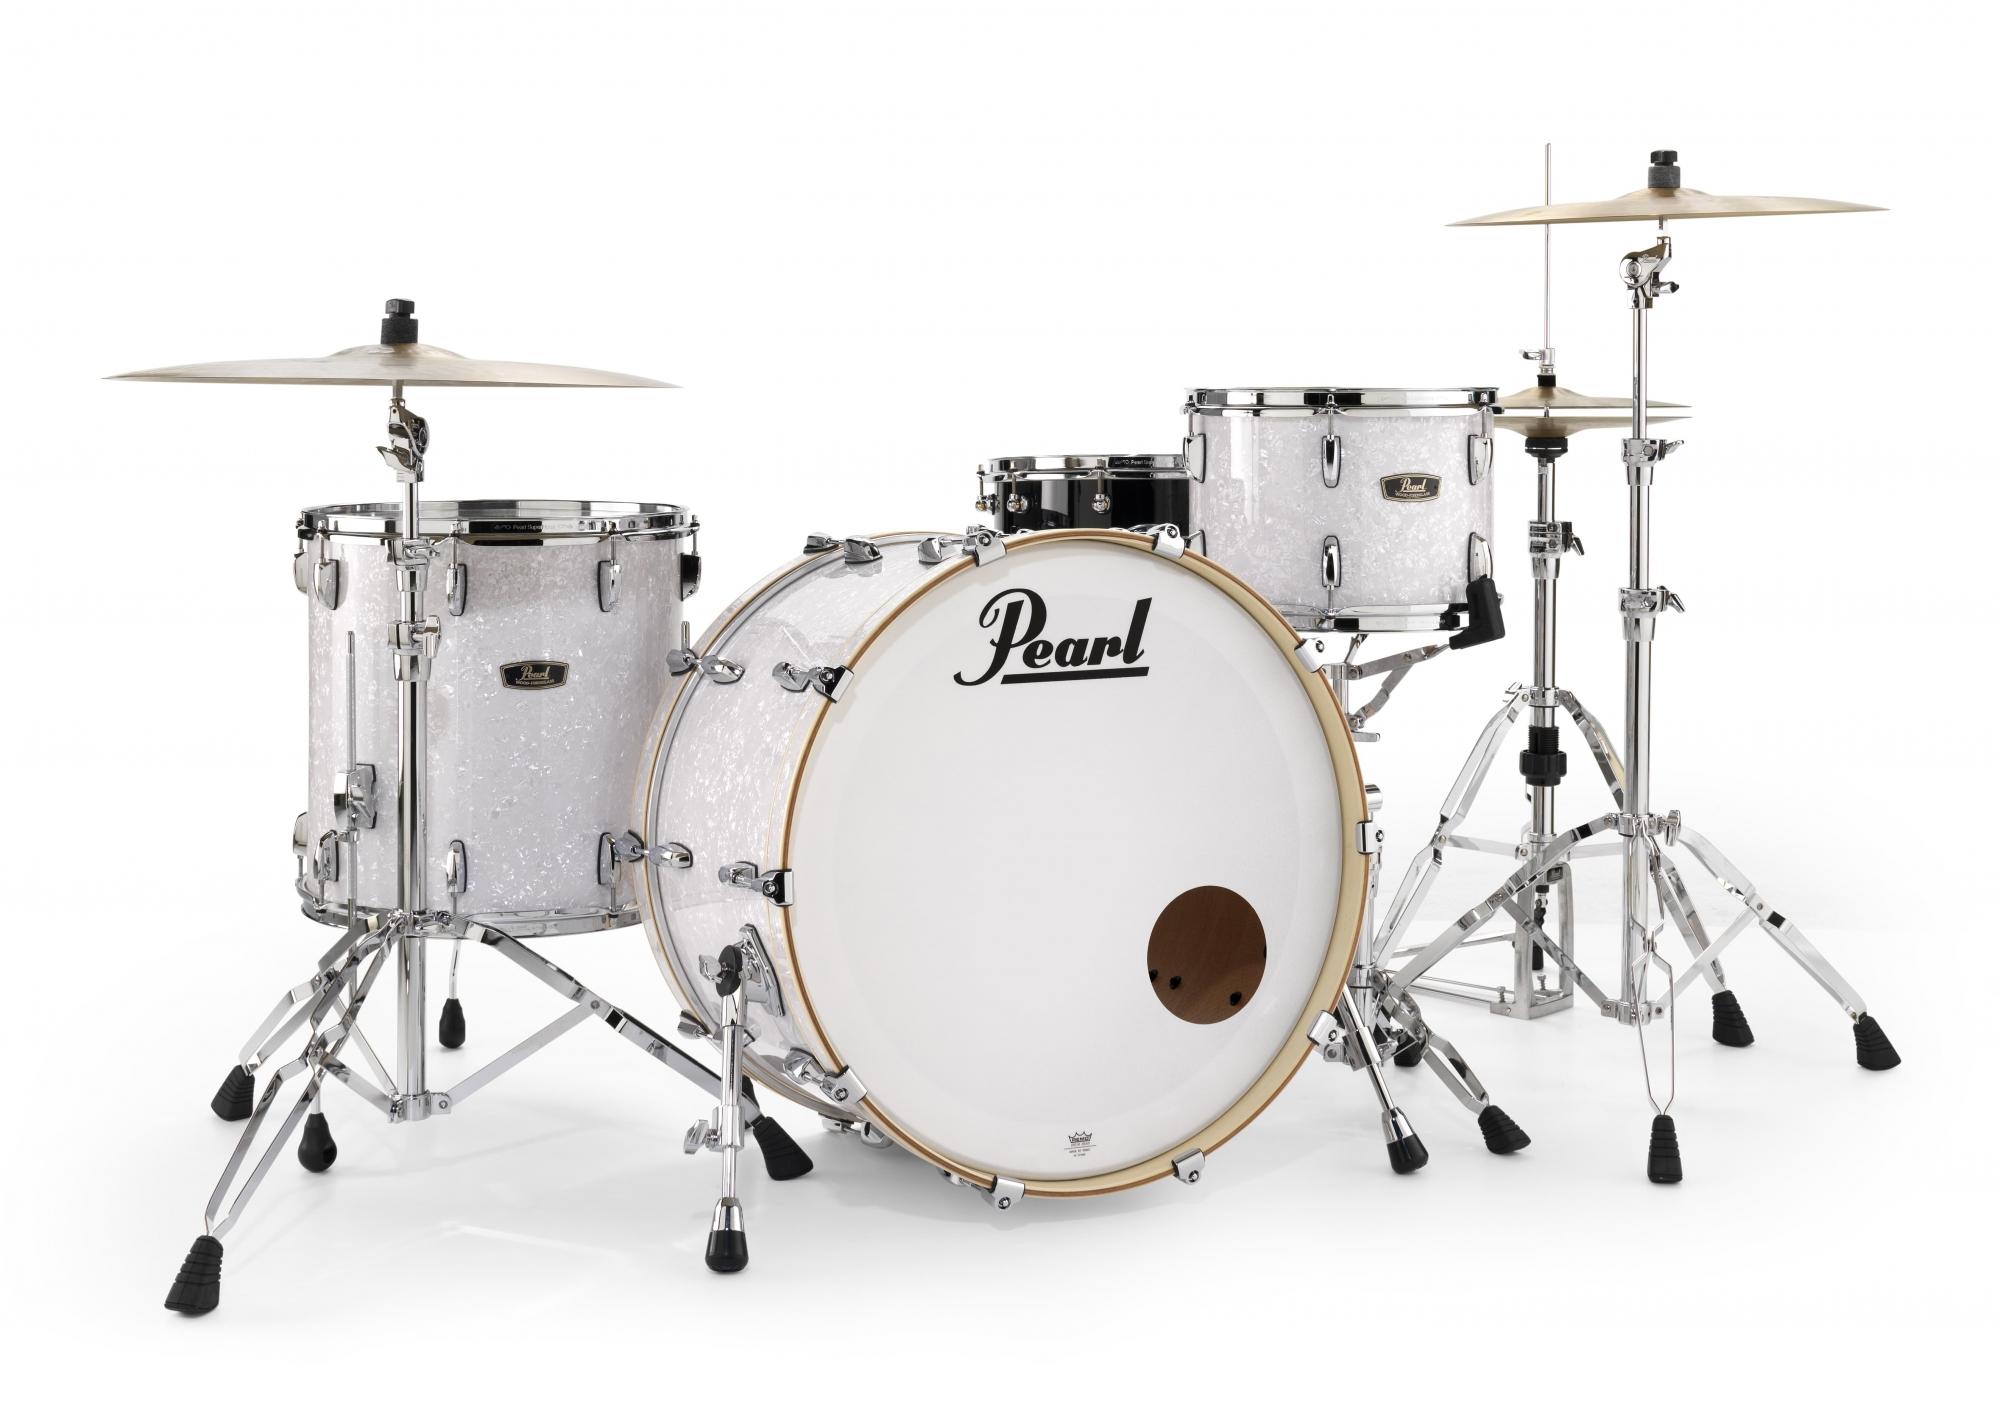 Billede af Pearl Wood Fiberglass Standard Trommesæt White Marine Pearl